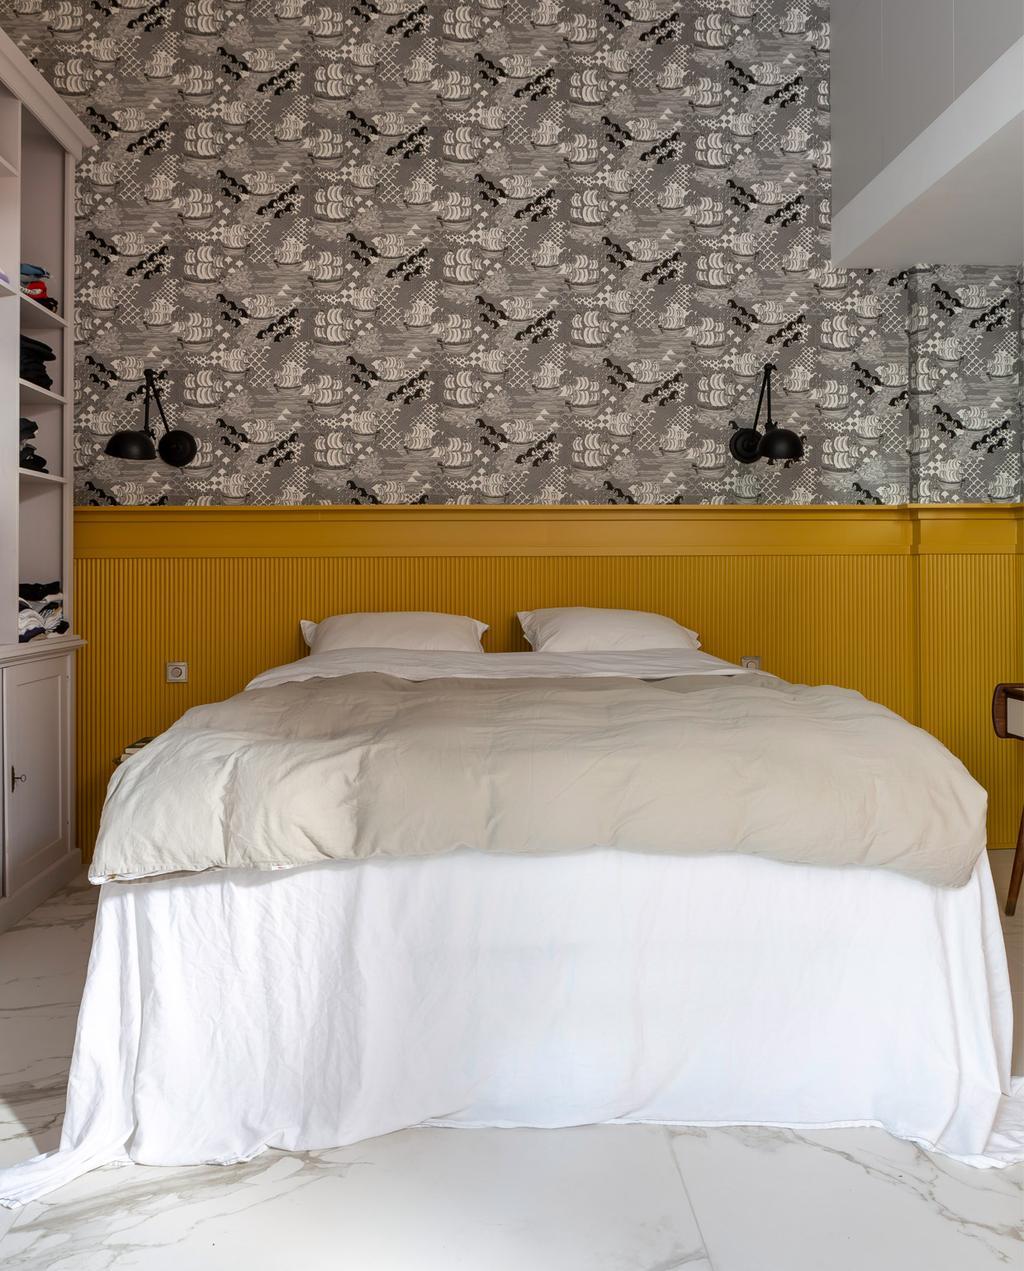 vtwonen | binnenkijken | loft | slaapkamer